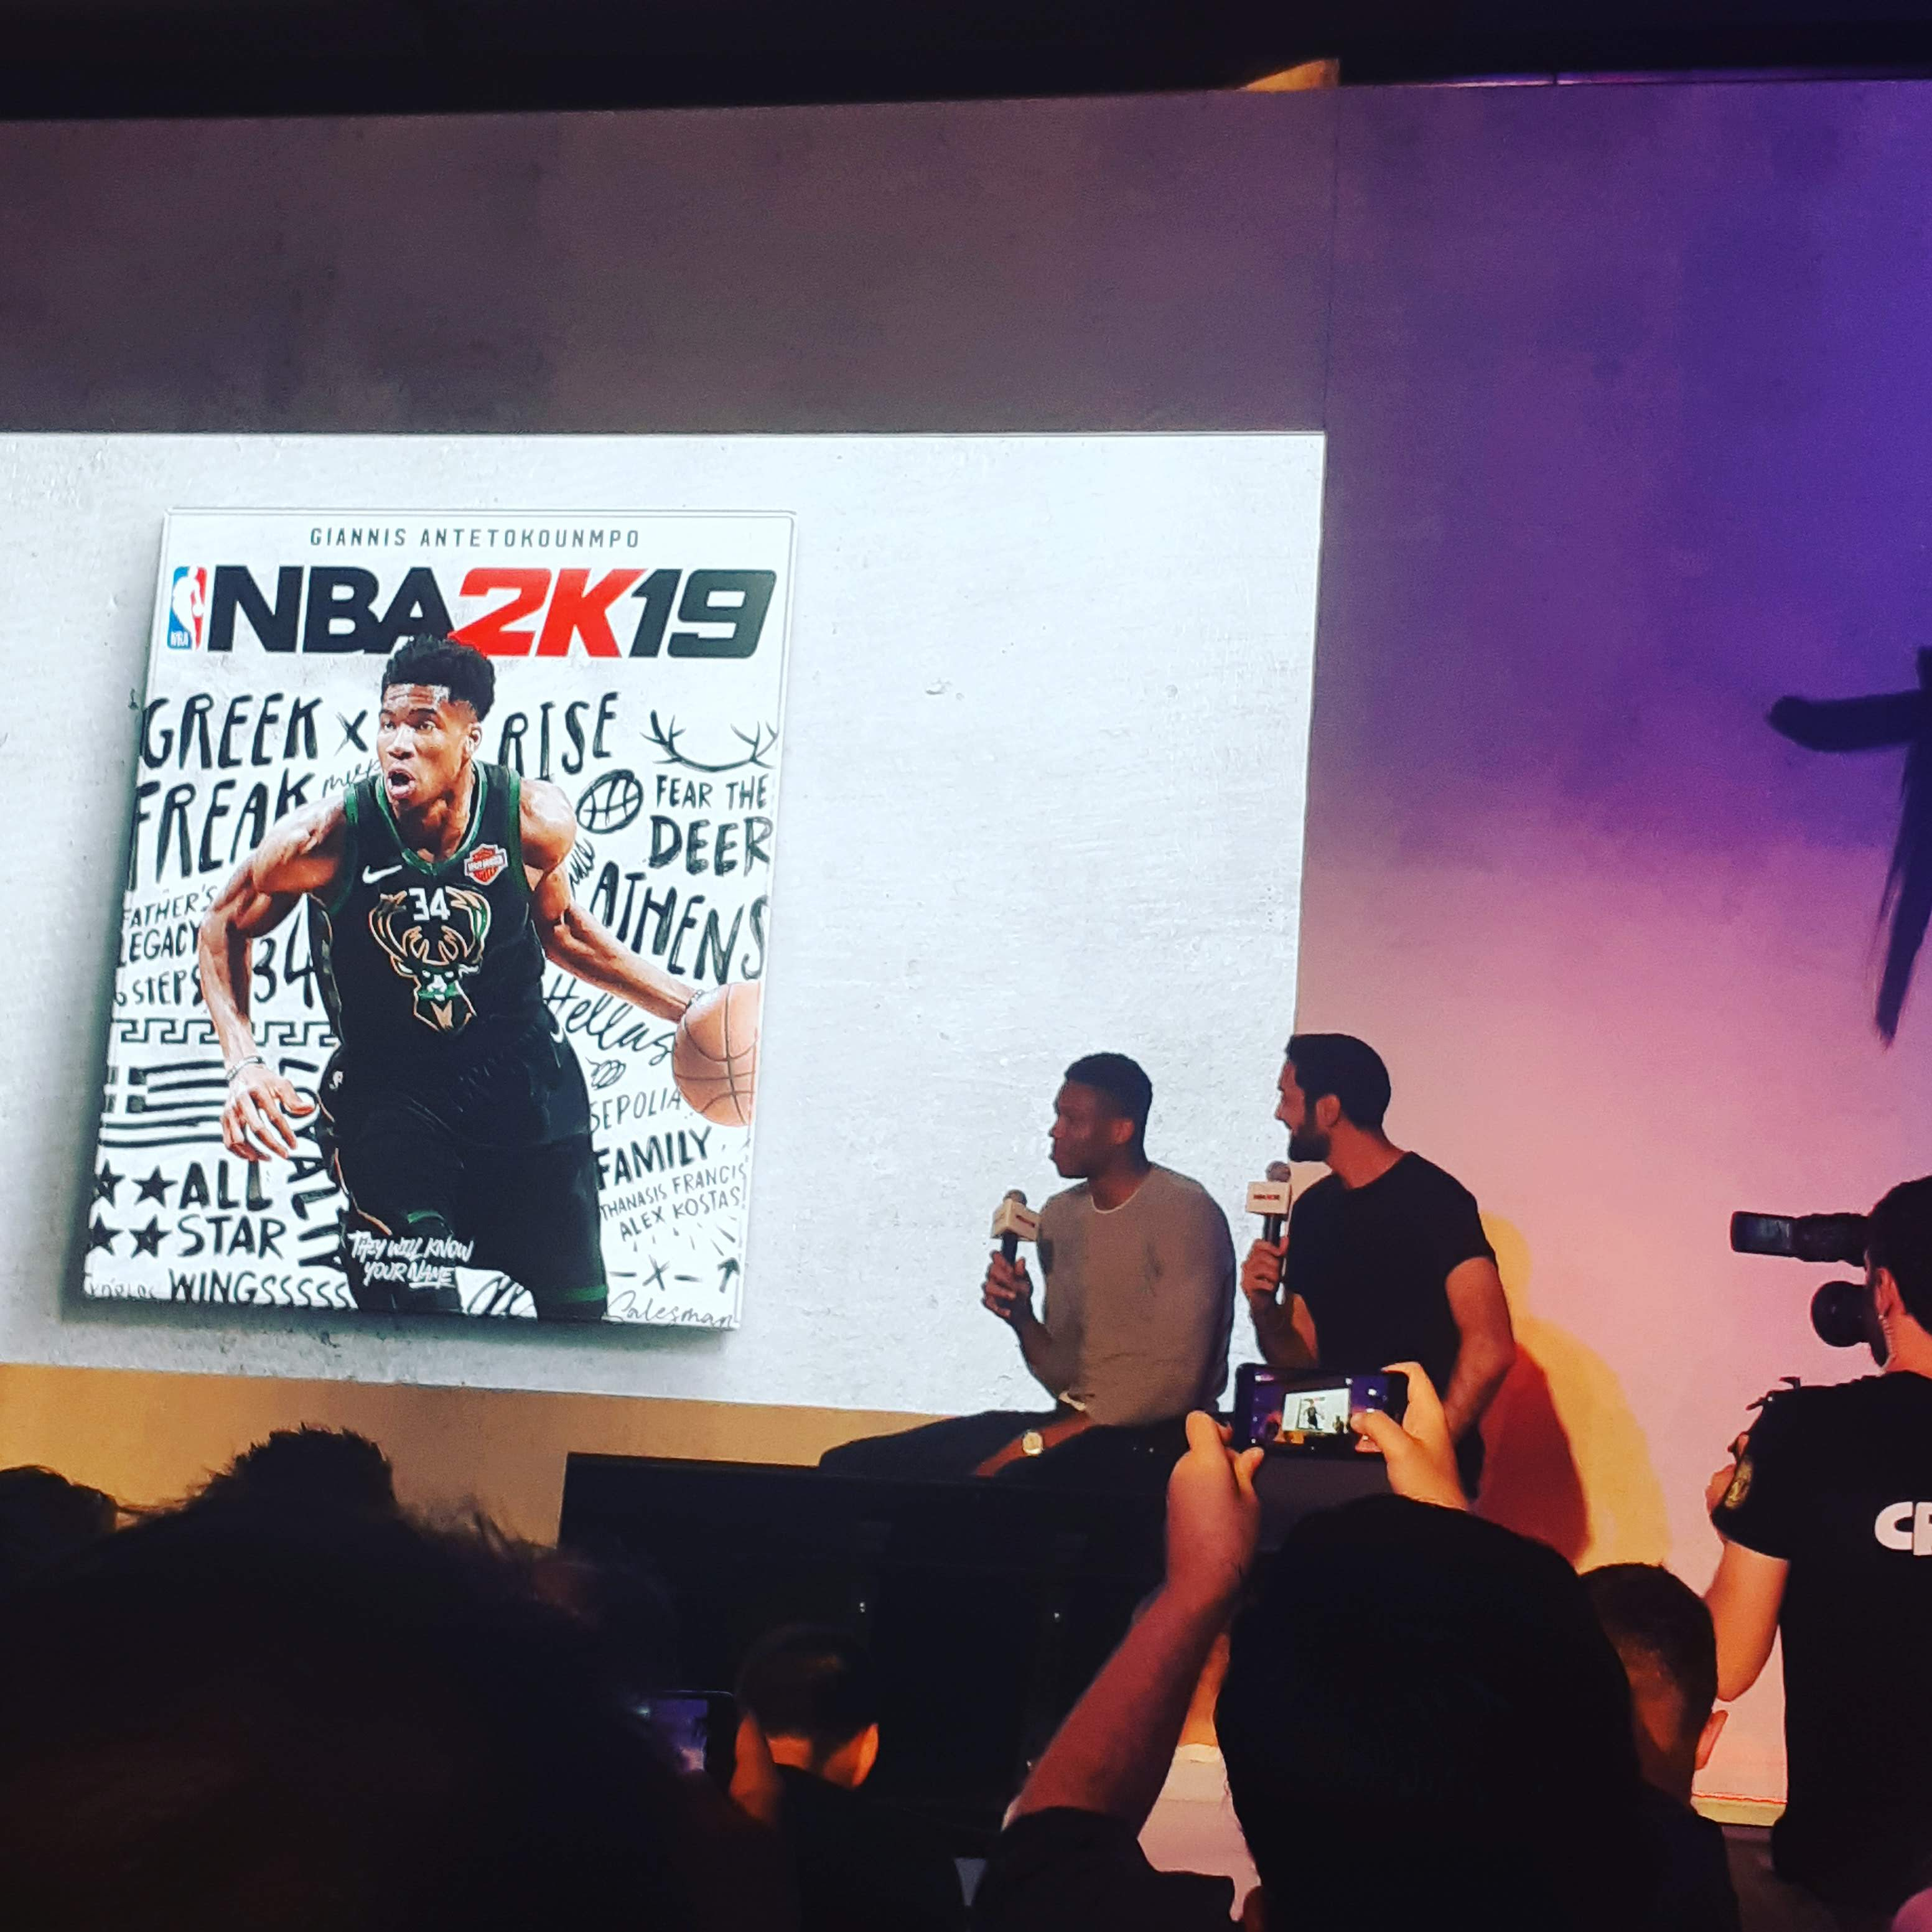 NBA2k19: Η παγκόσμια πρεμιέρα με Γιάννη Αντετοκούνμπο έγινε στην Ελλάδα κι εμείς ήμασταν εκεί 1